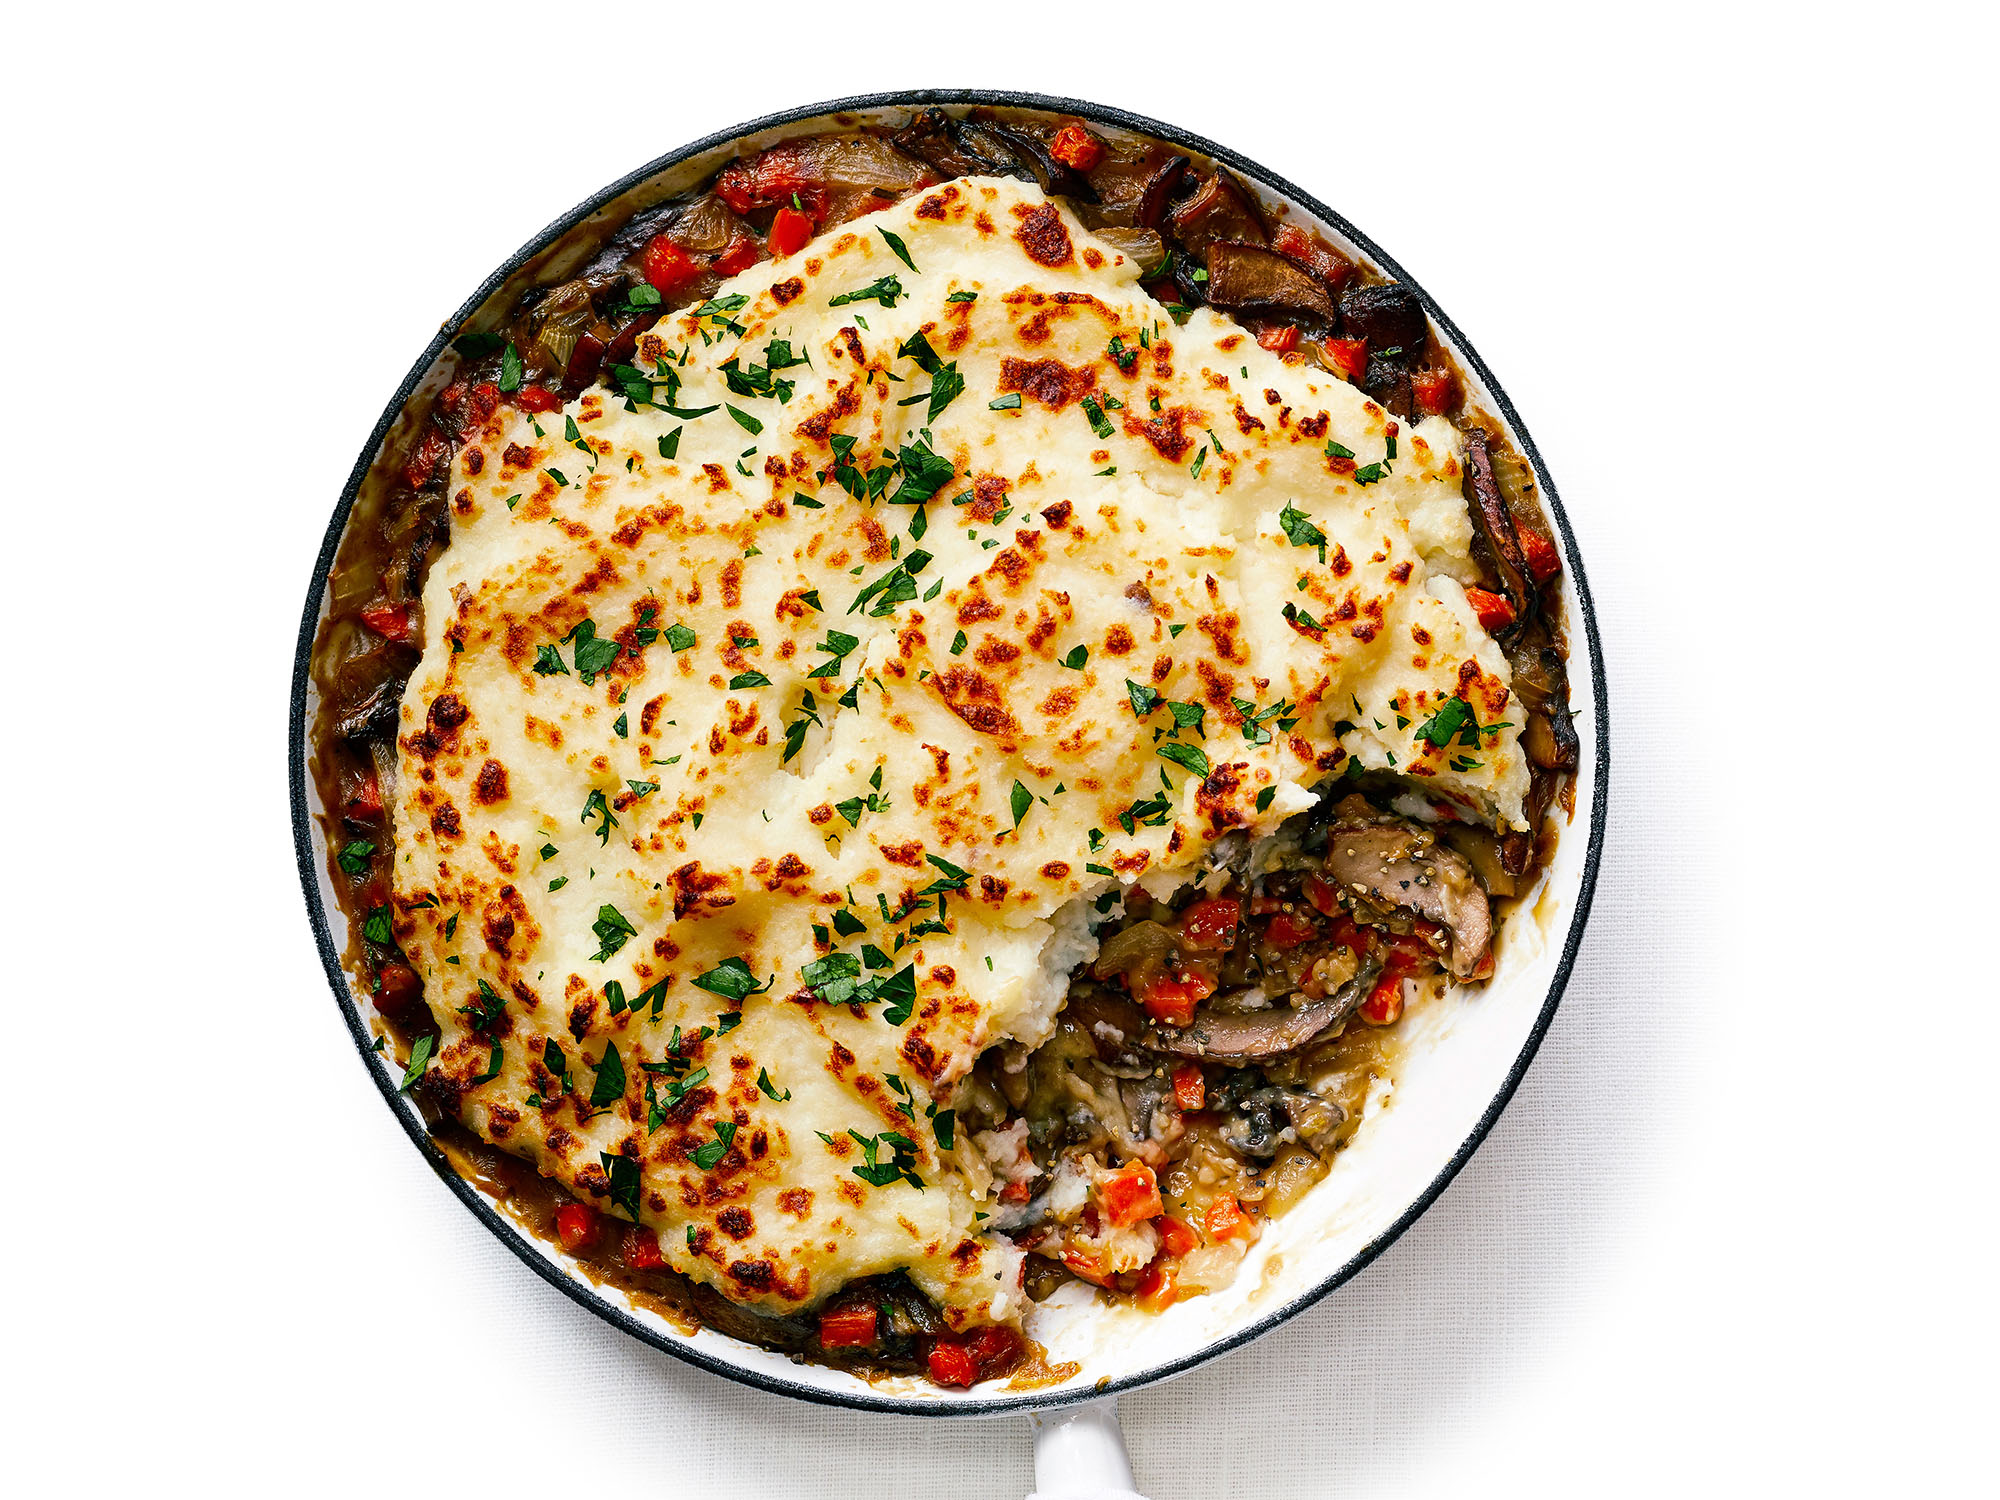 One-Pan Portabella Mushroom Shepherd's Pie